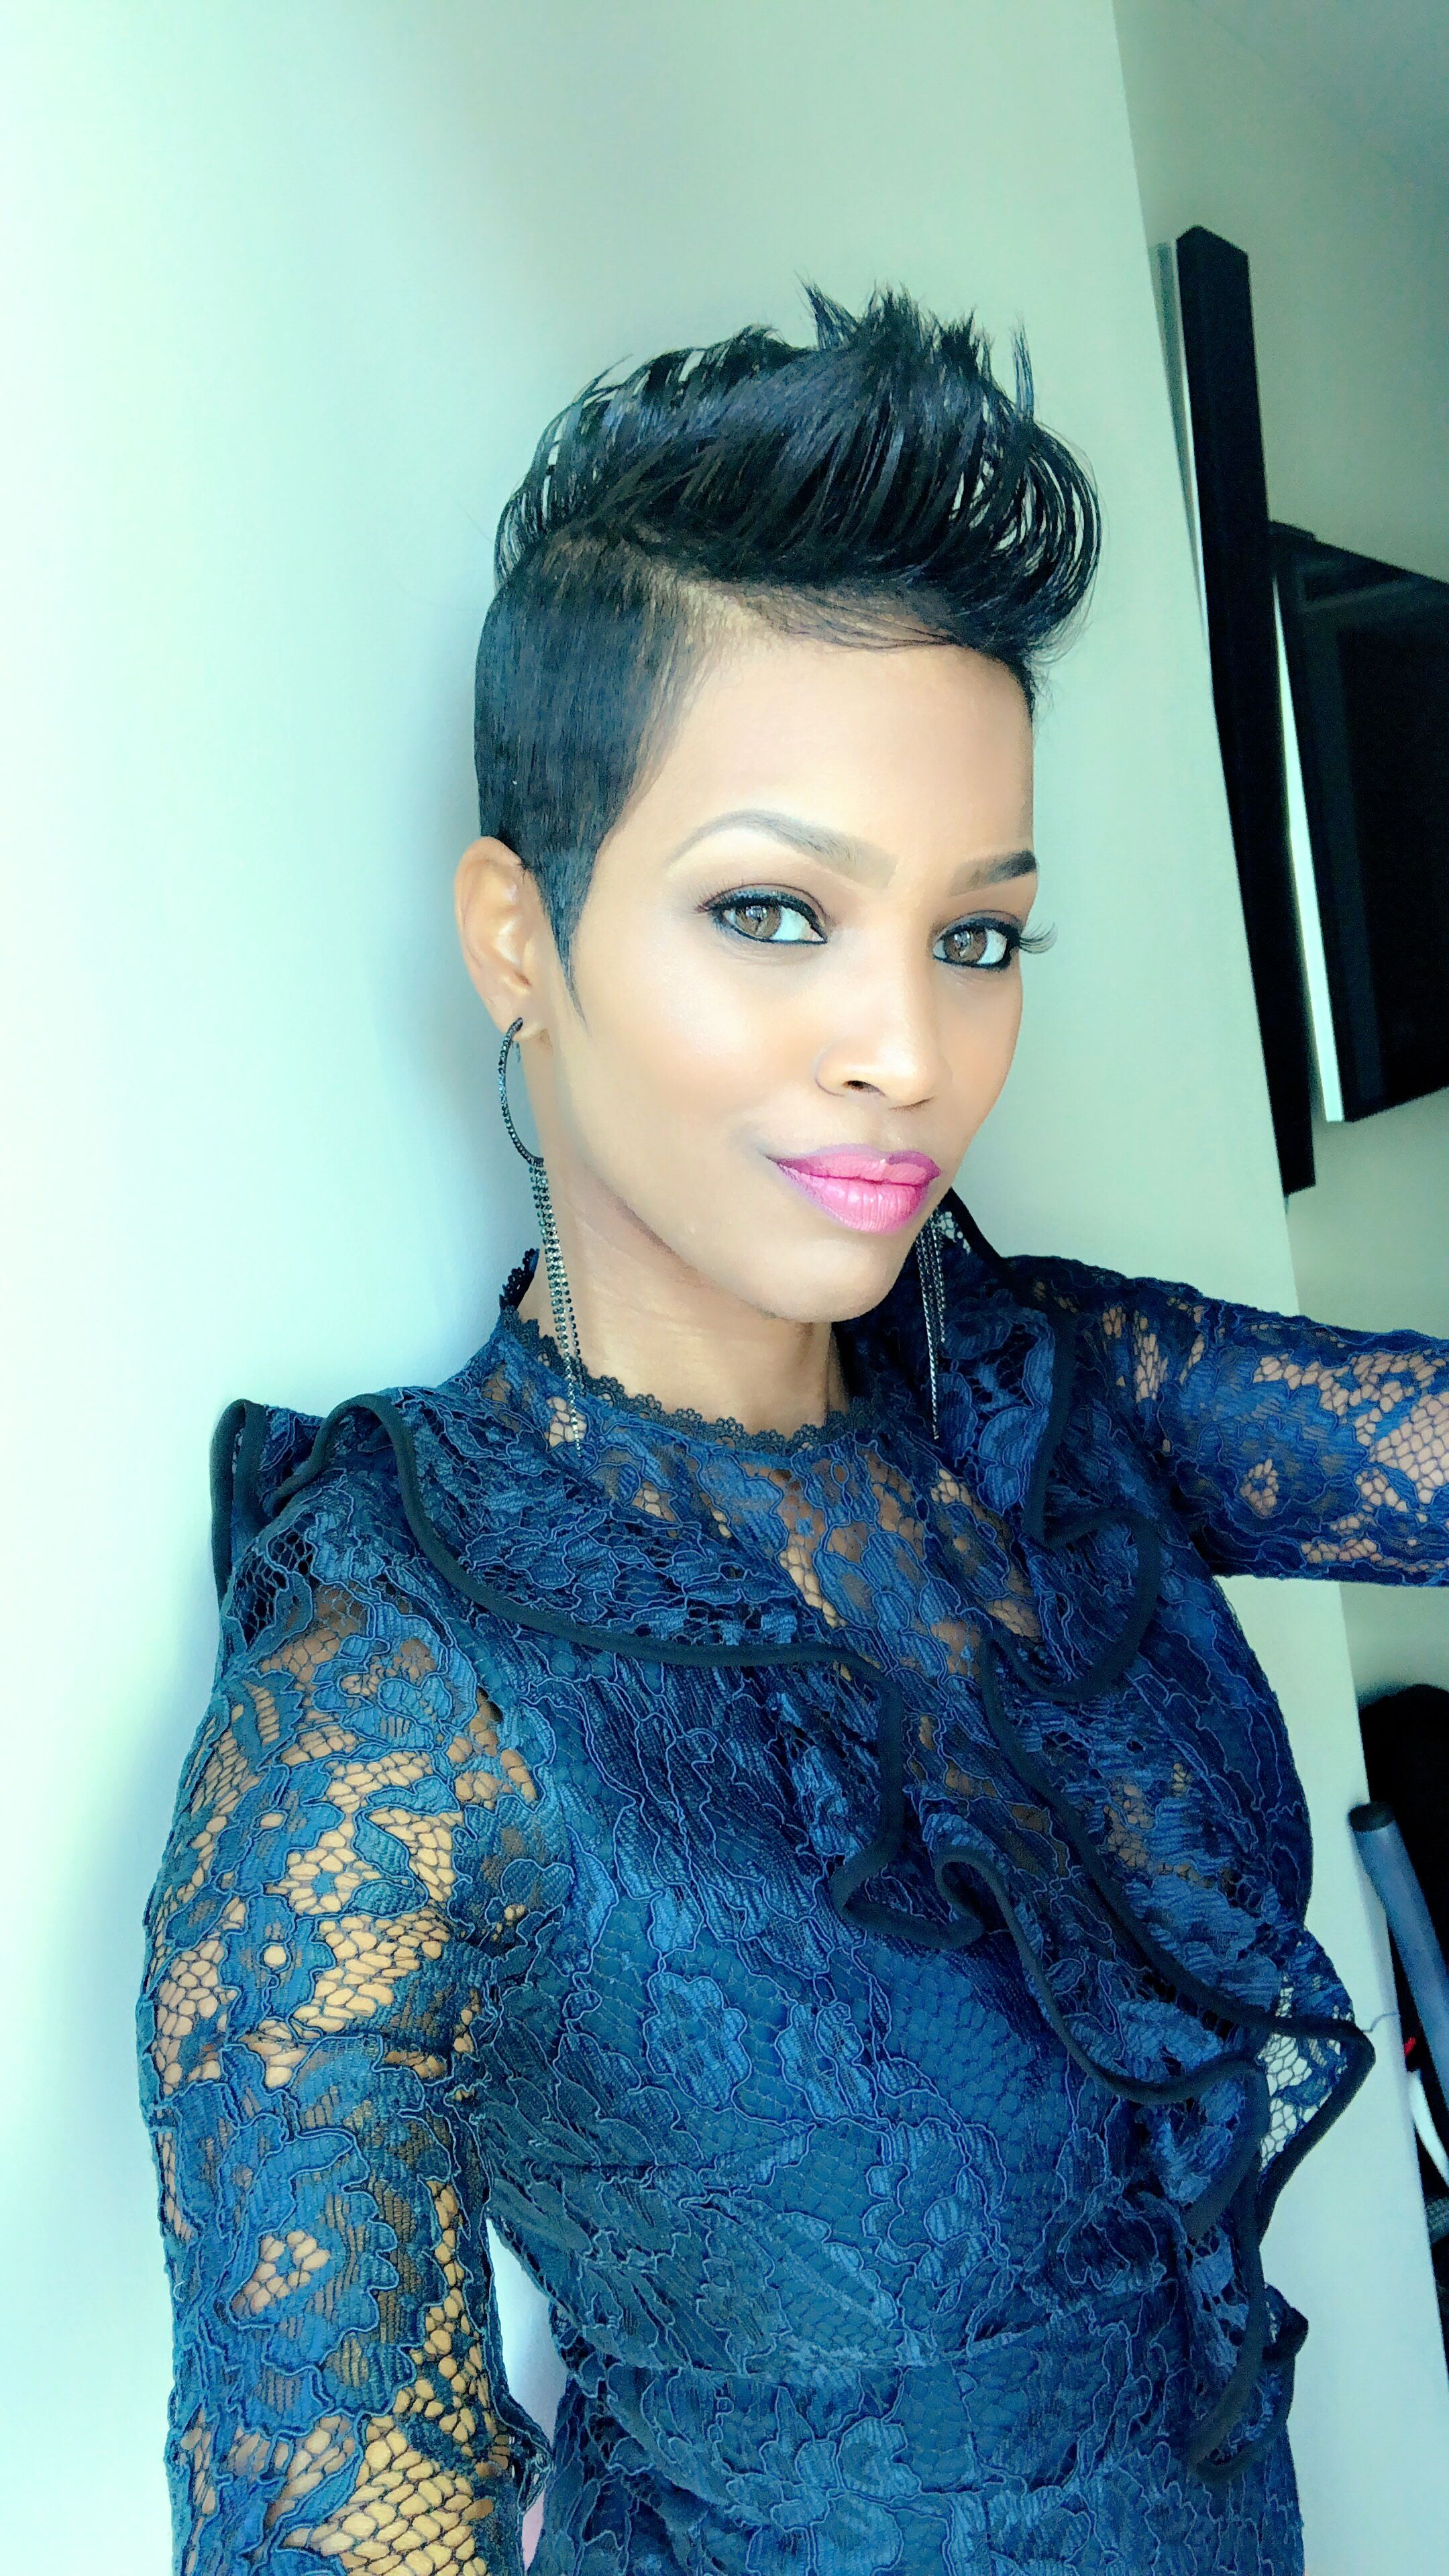 Hair u makeup is real cute mohawks u short cuts for black women